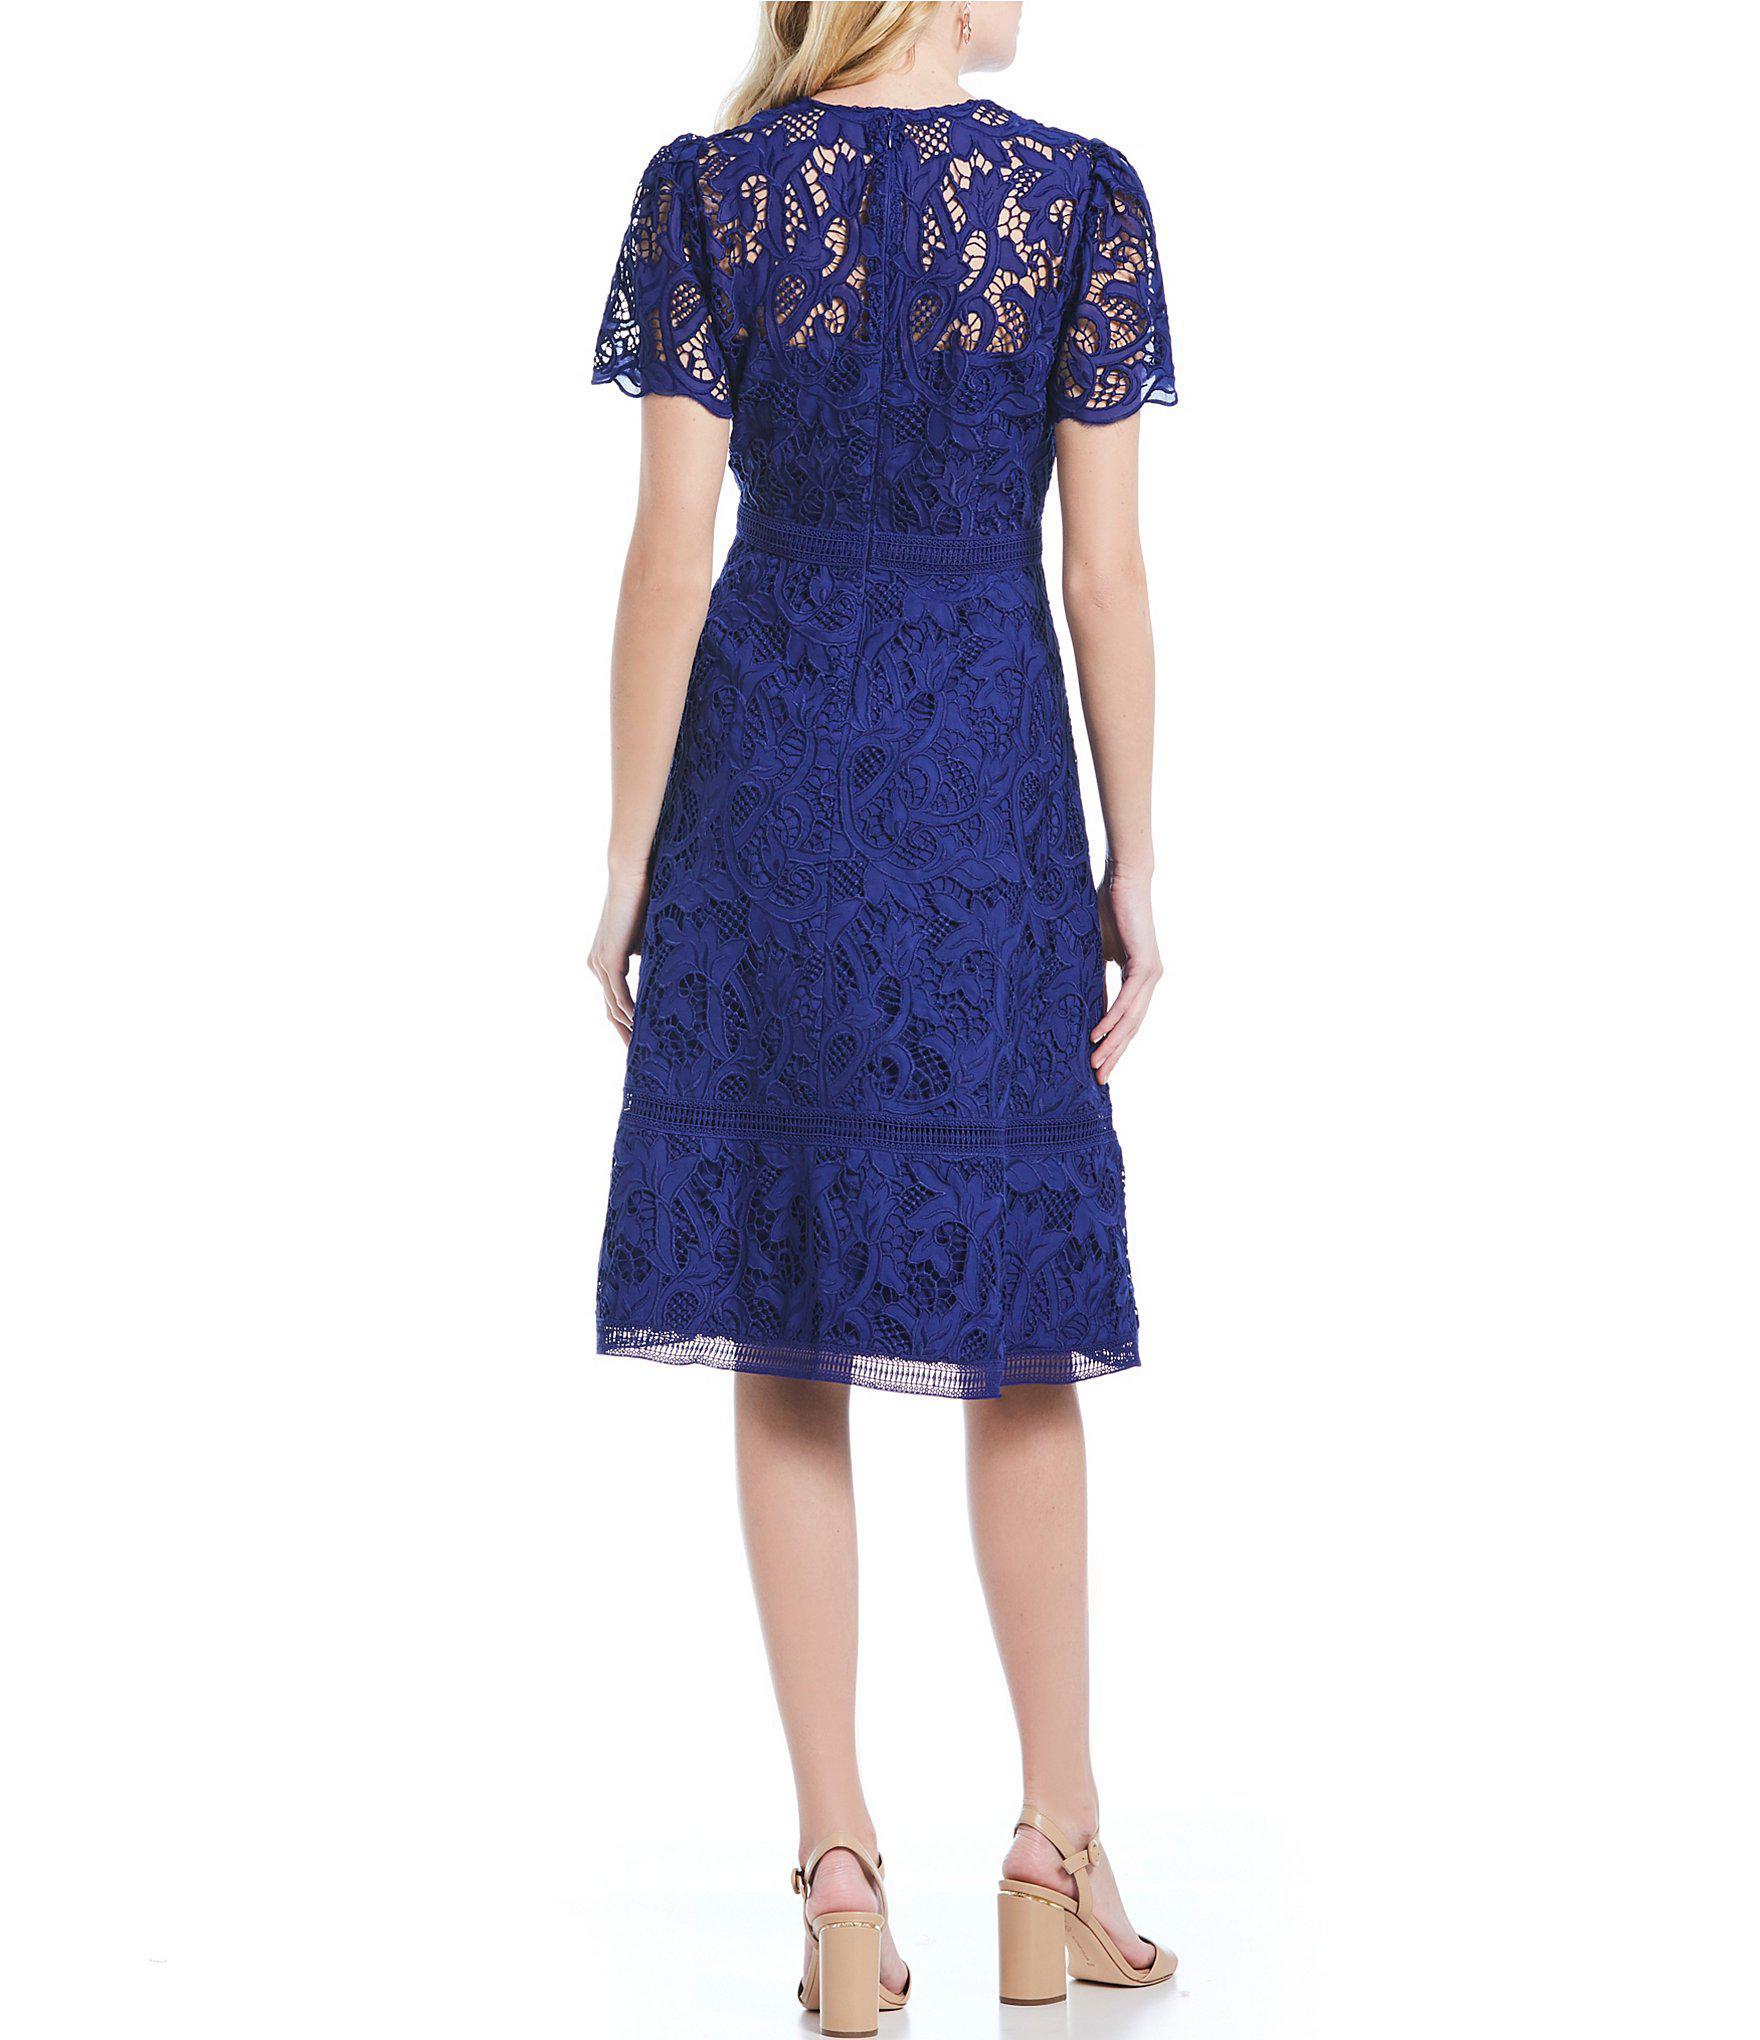 c0b48041f20 Antonio Melani Dresses At Dillards